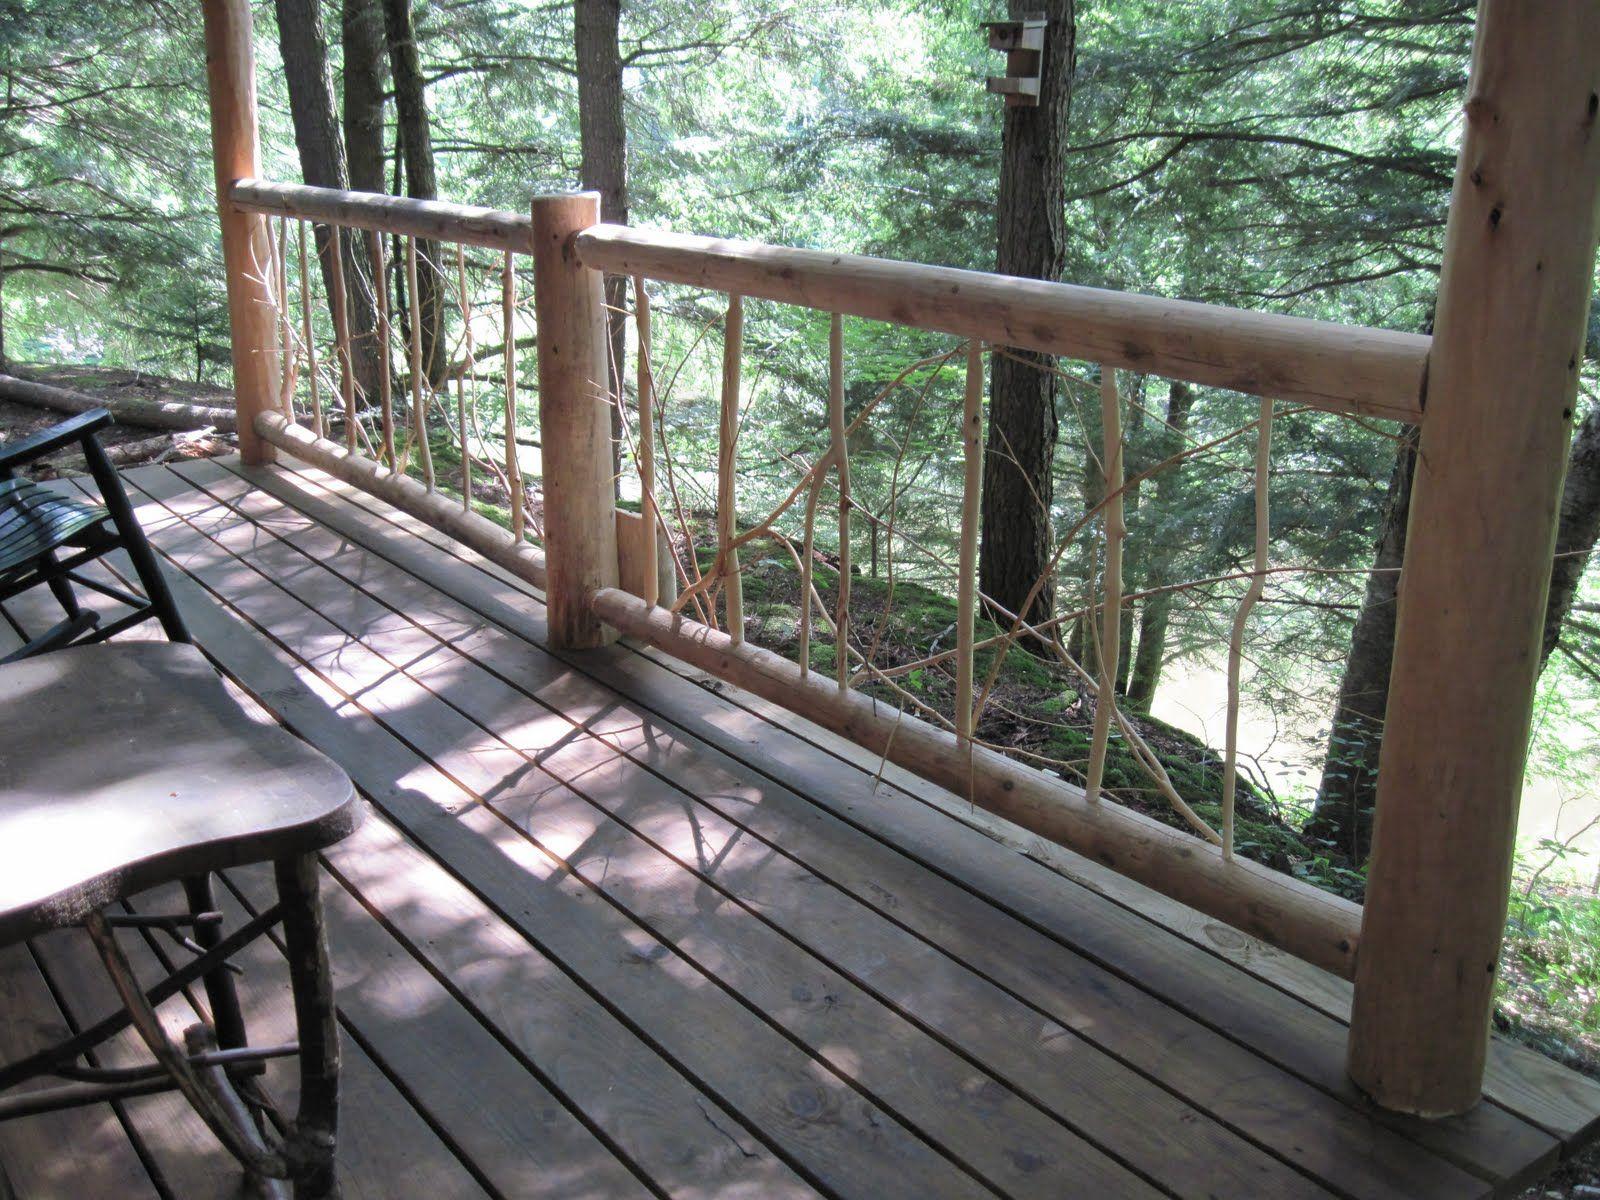 Rustic decks rustic porch railing rustic deck path for Rustic porches and decks